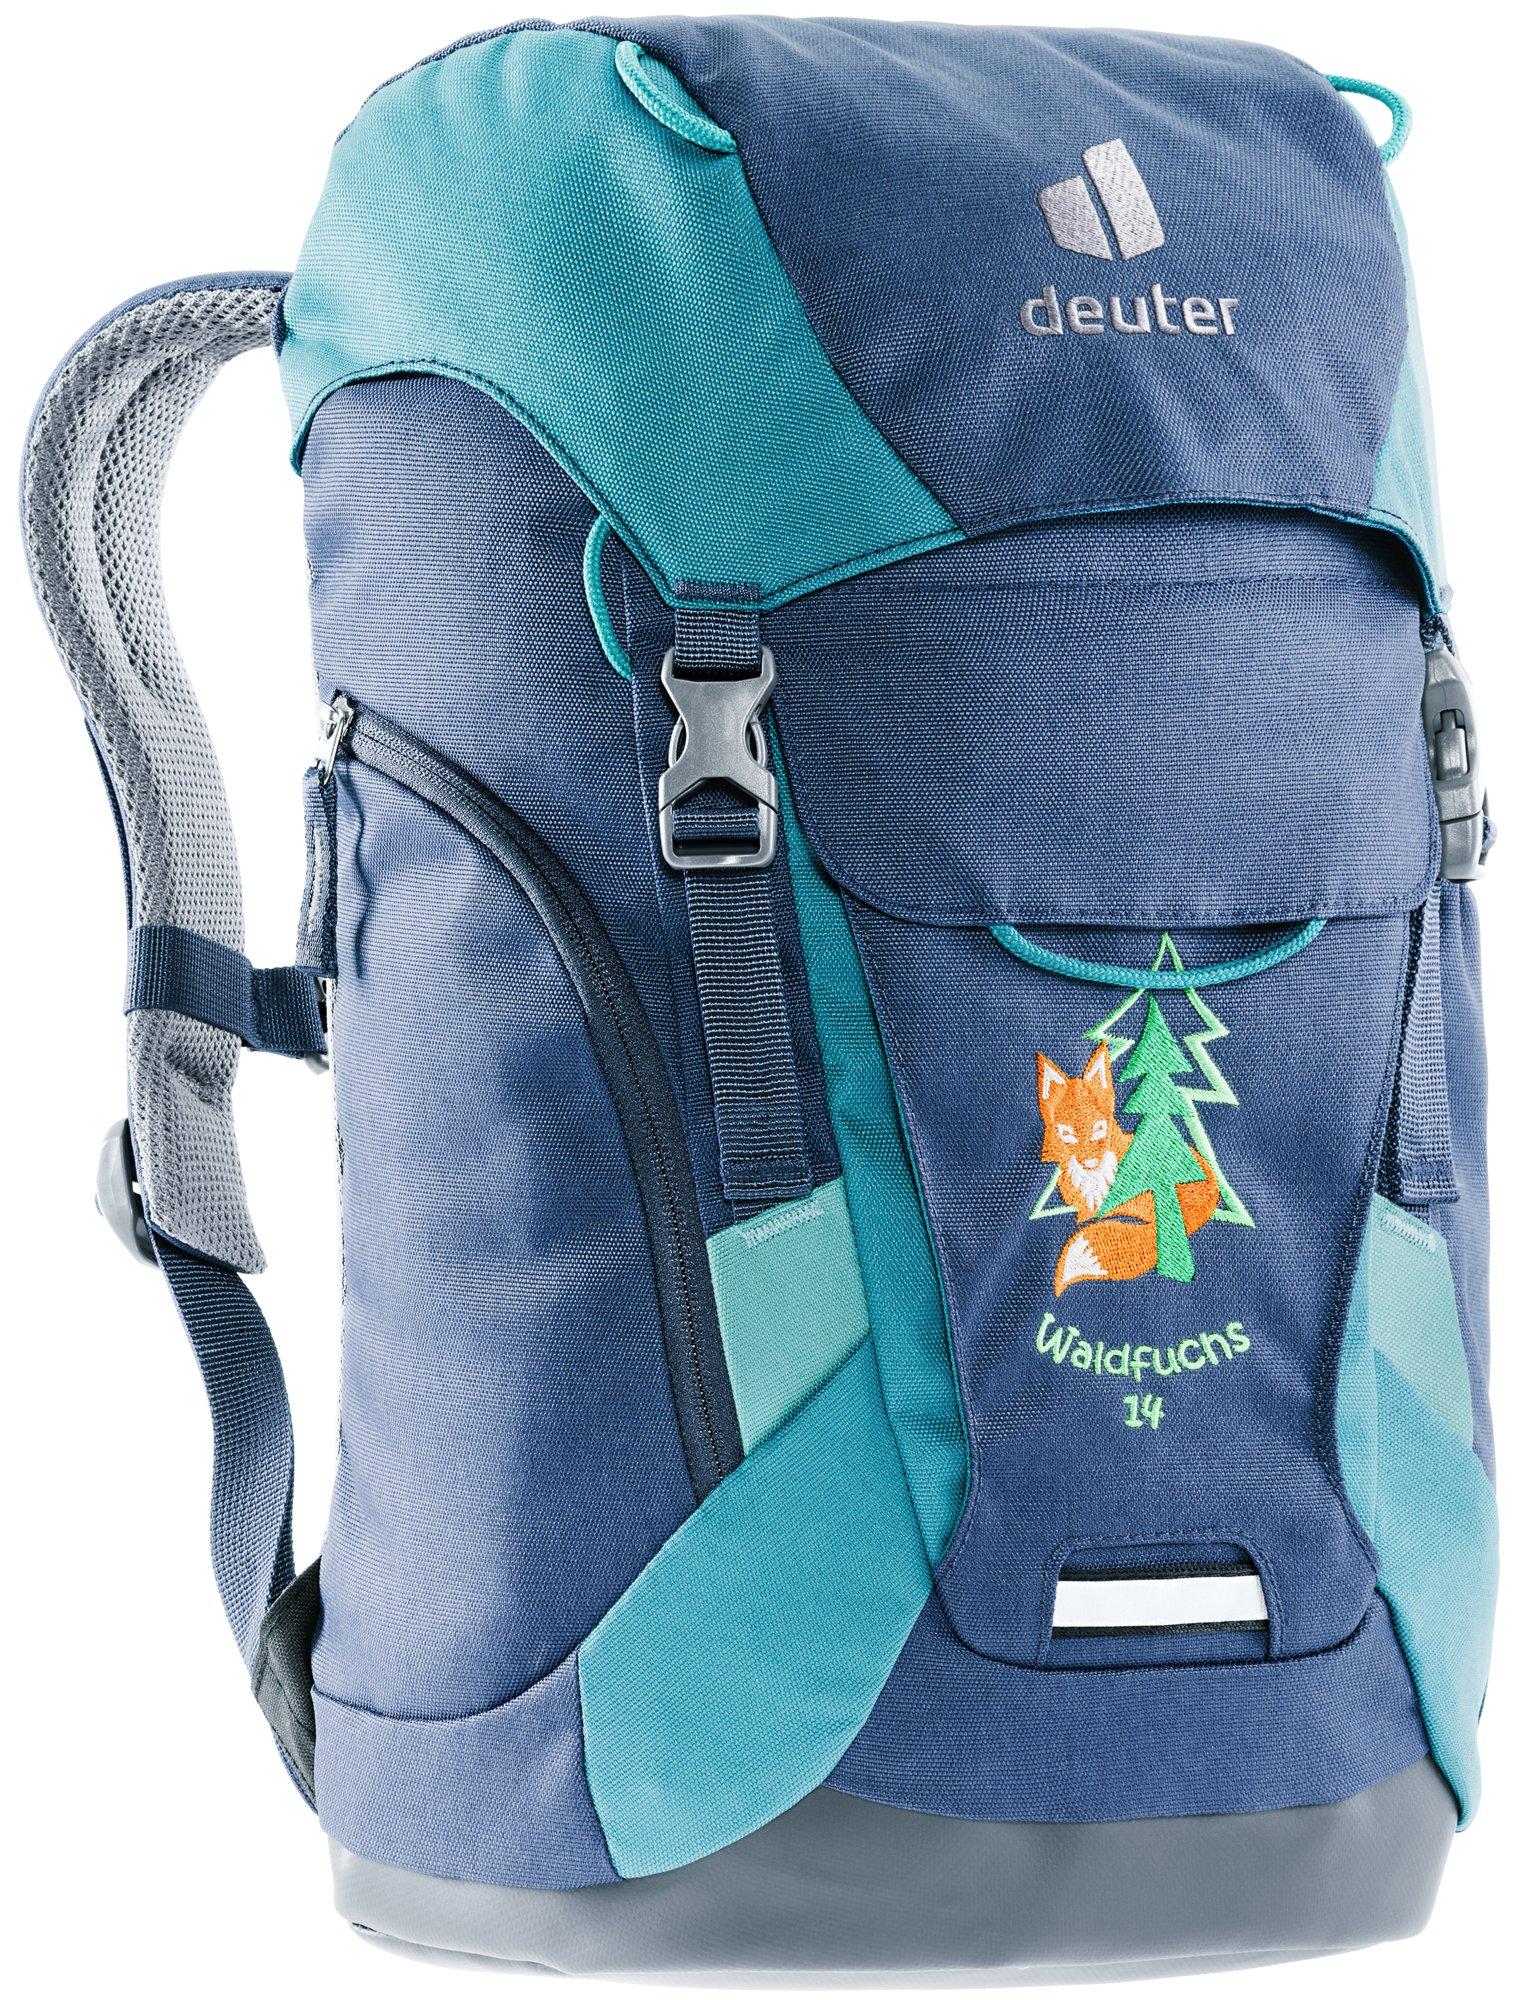 Deuter - Waldfuchs 14, Kinderrucksack